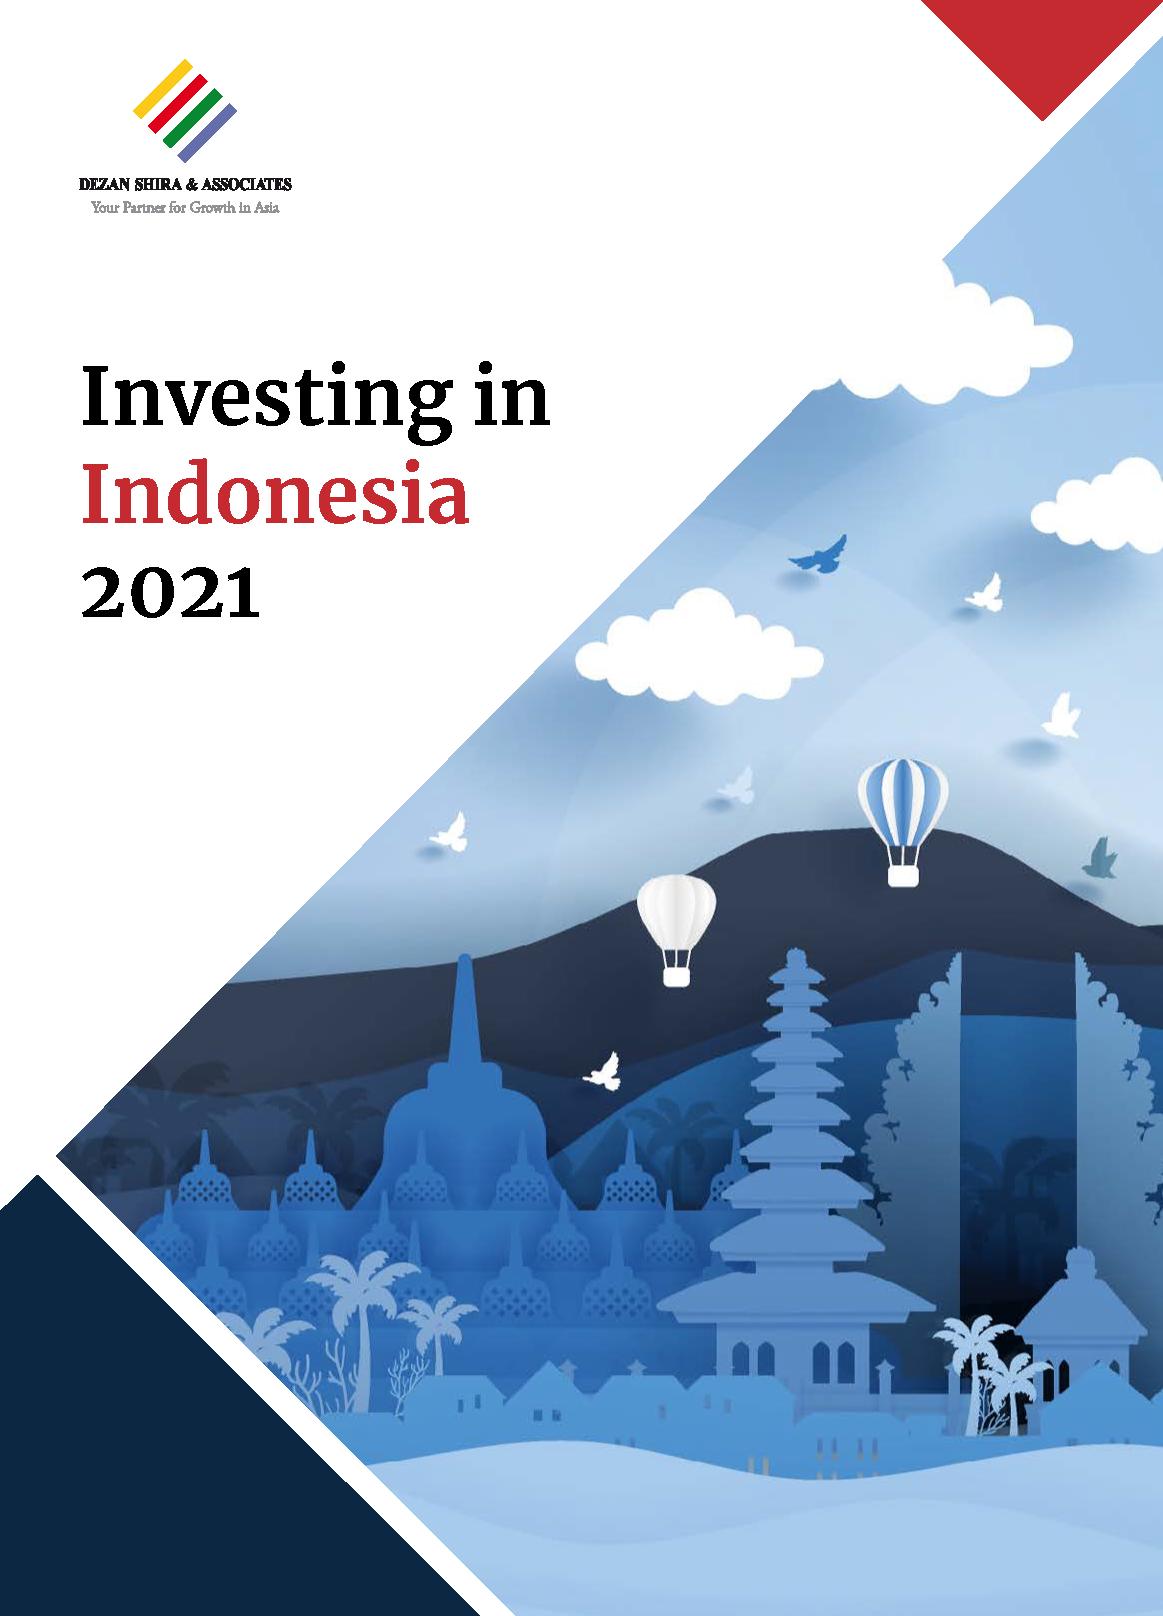 Investing in Indonesia 2021